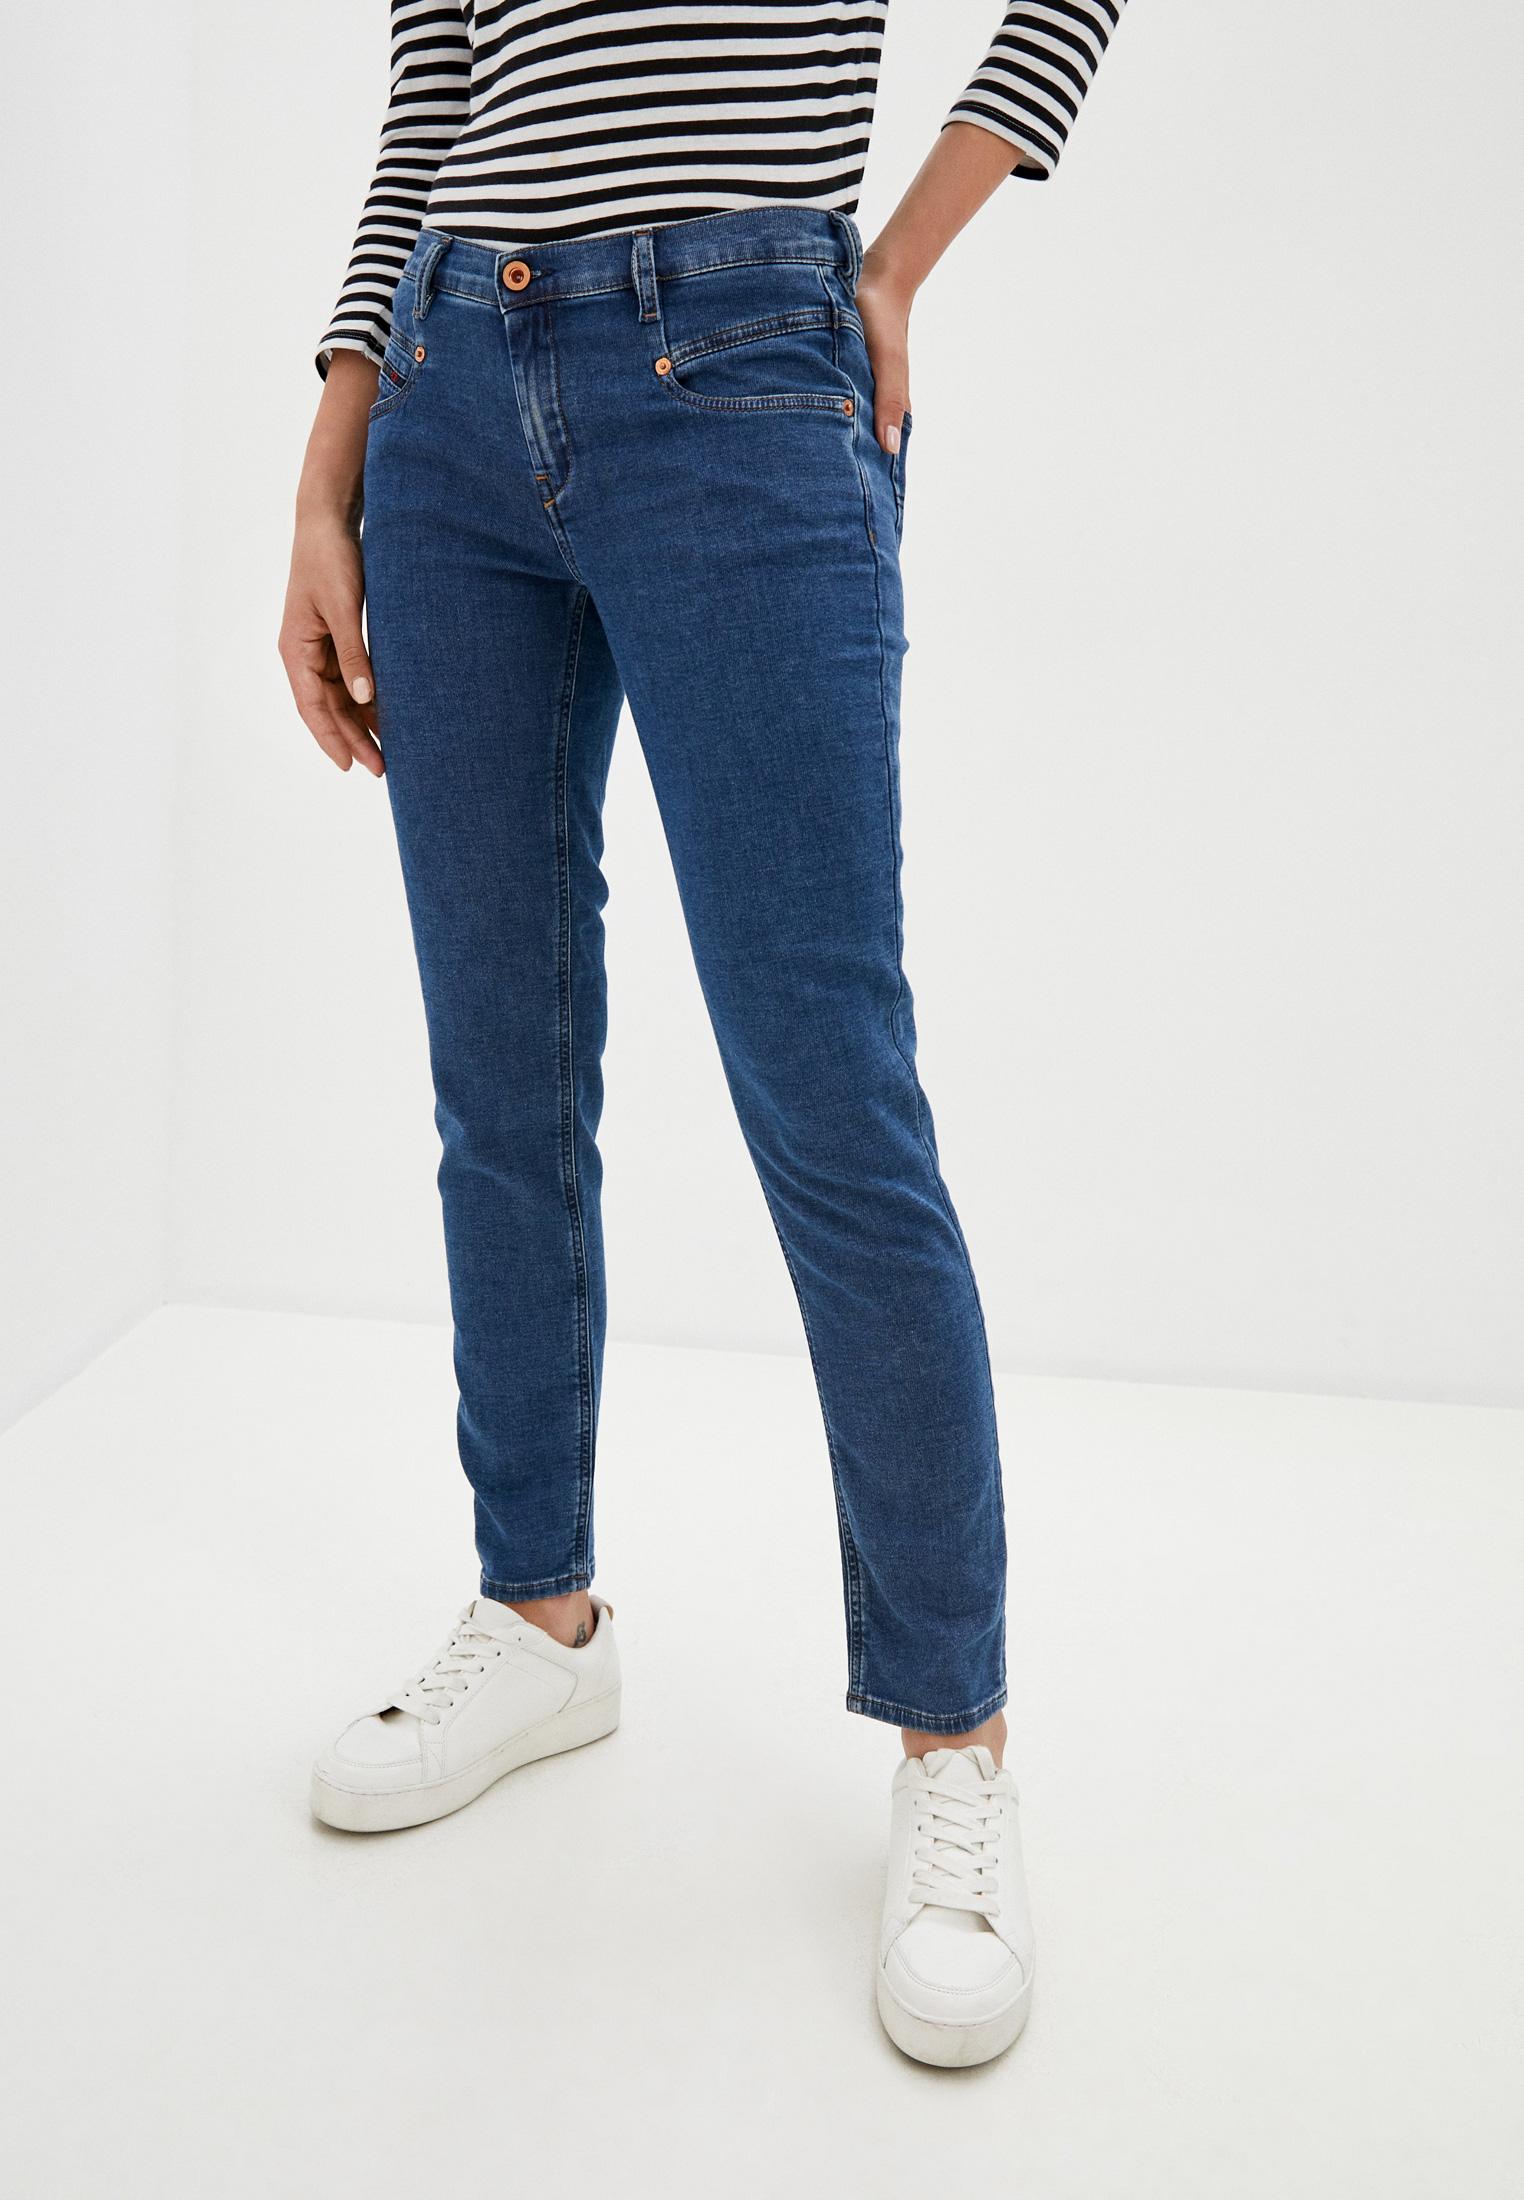 Зауженные джинсы Diesel (Дизель) 00SZ9Z084PS